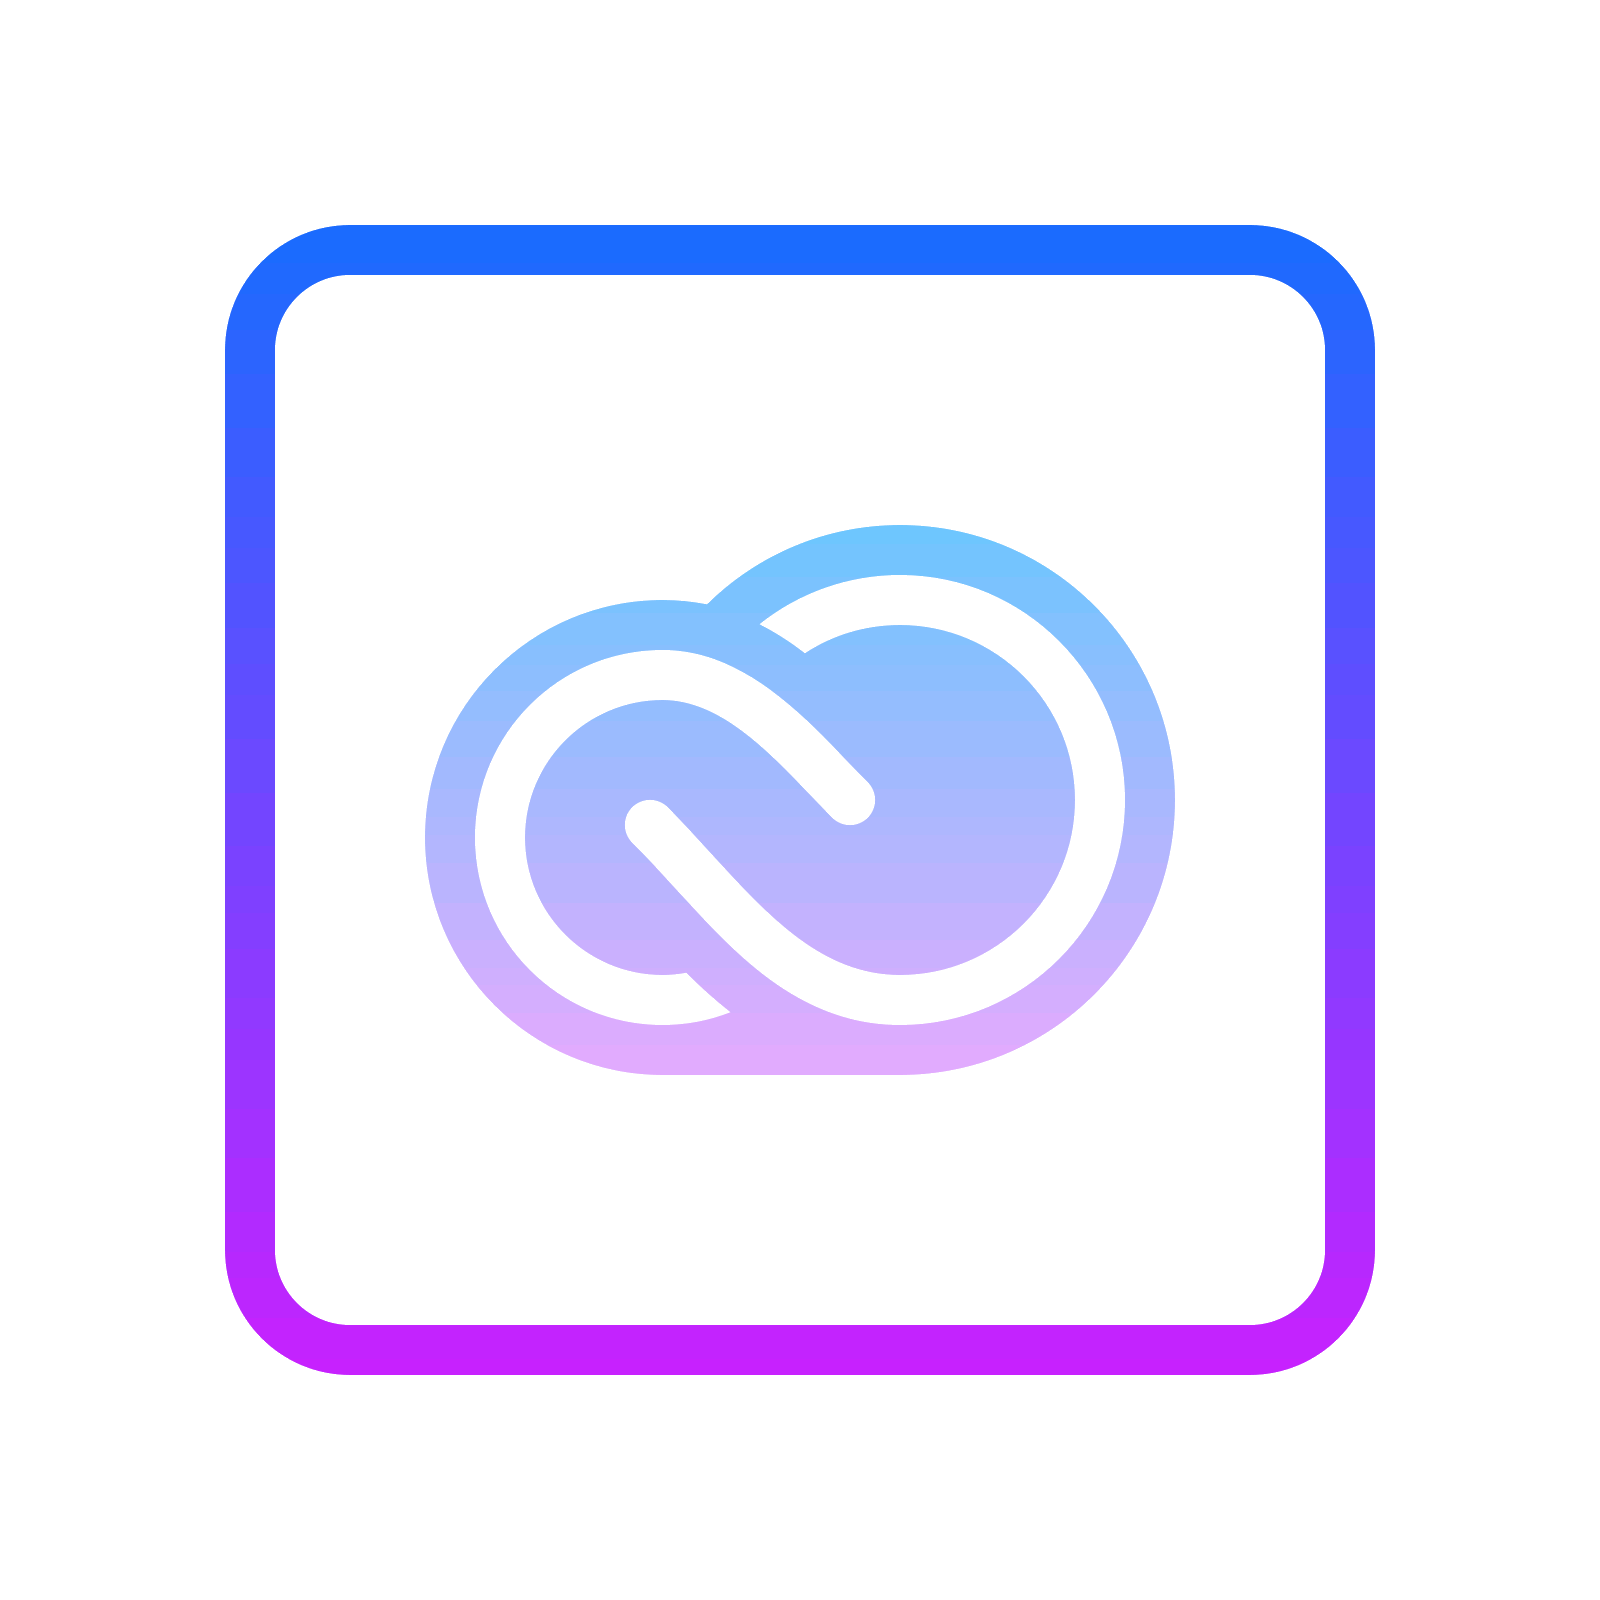 Adobe creative icon free. Cloud clipart rectangle